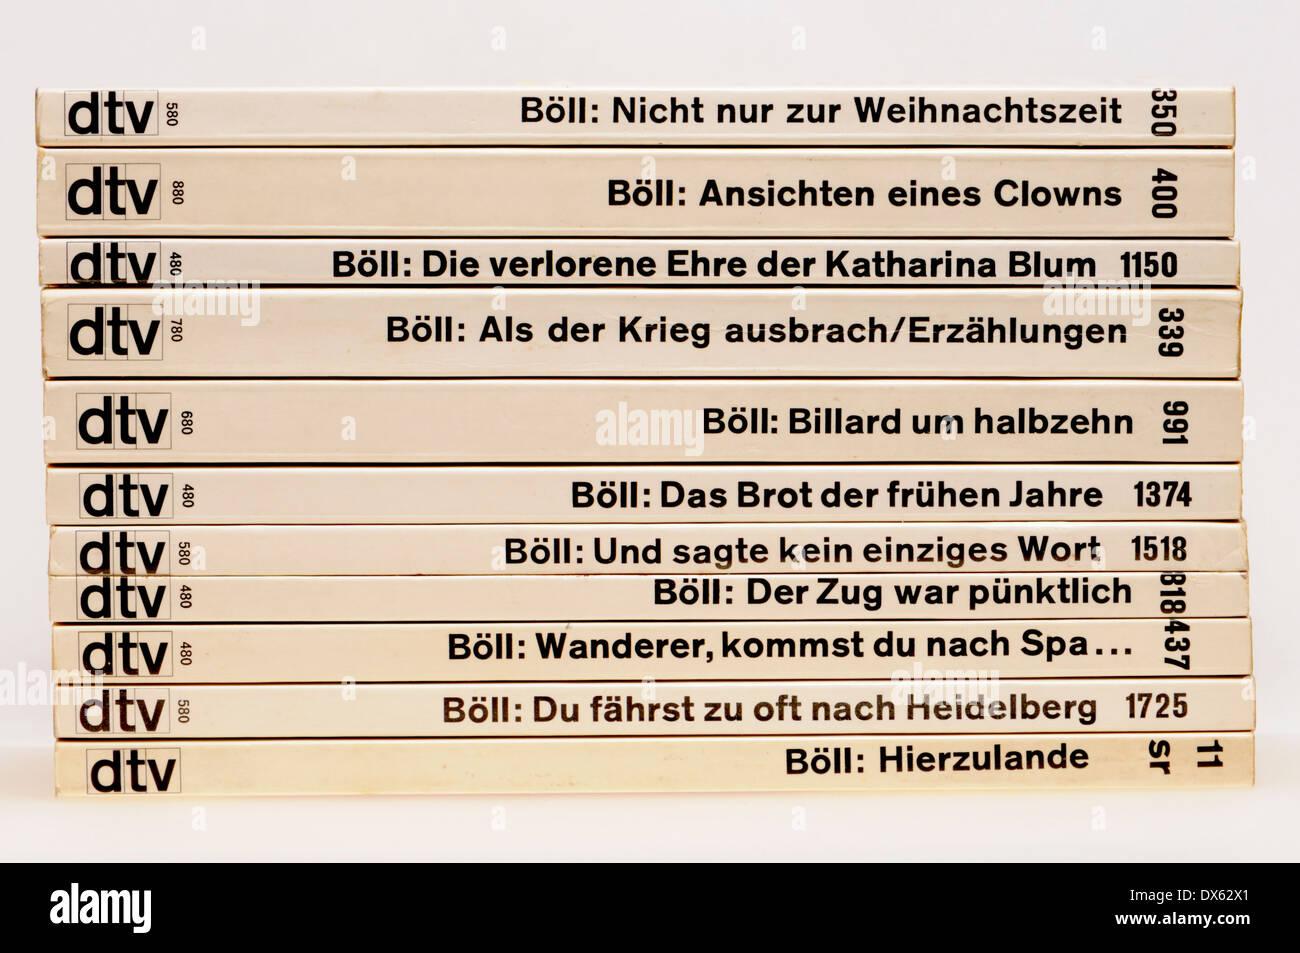 Heinrich Boll paperback novels in German - Stock Image